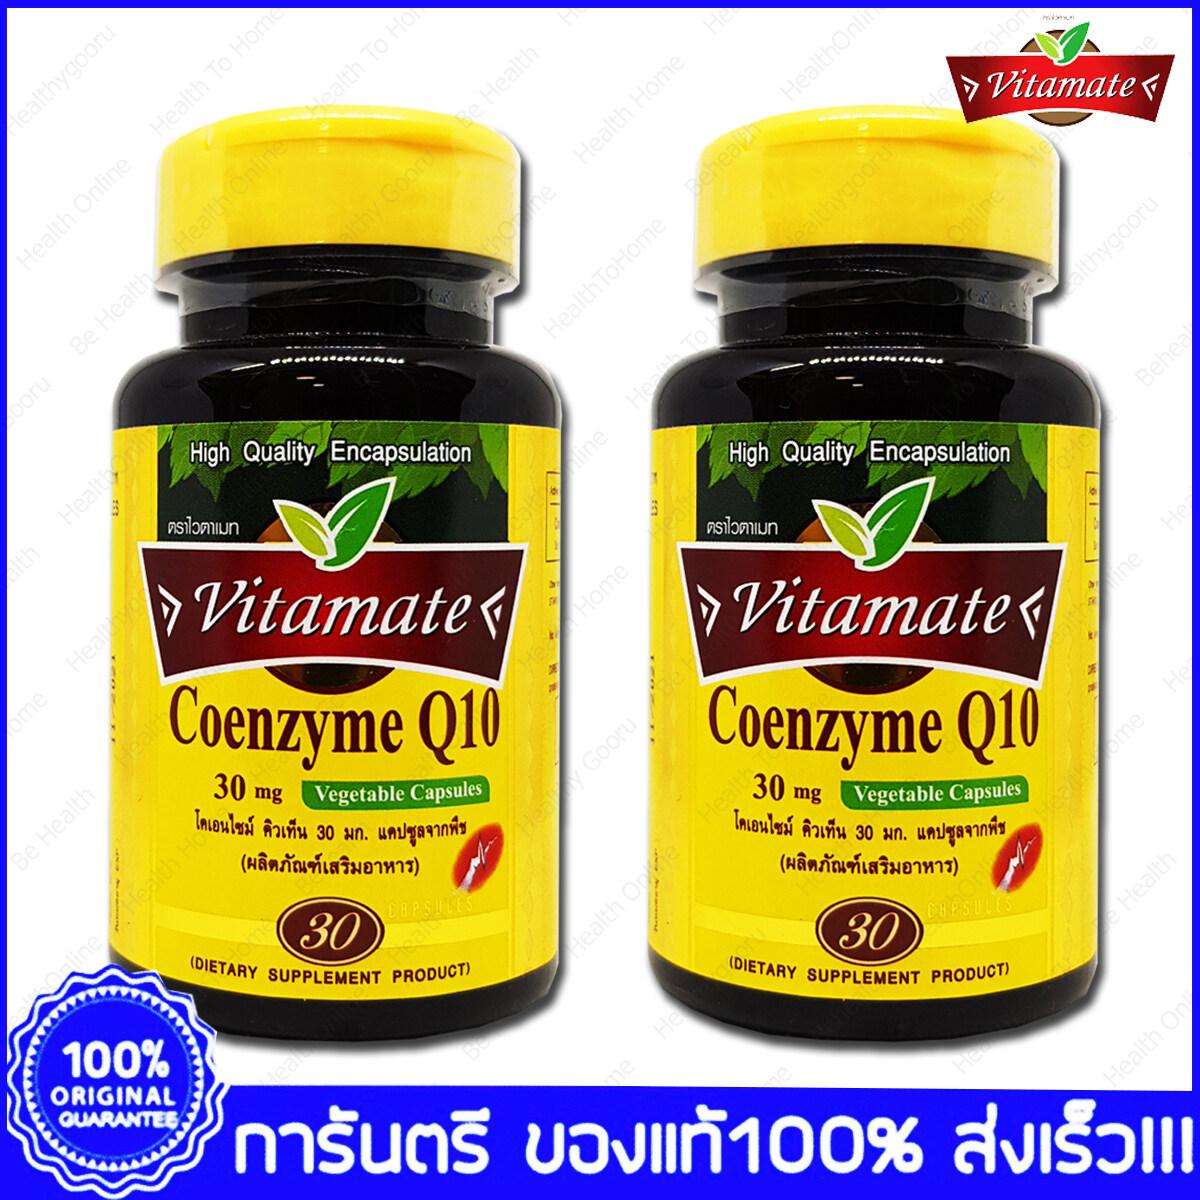 Coenzyme Q 10 Vitamate Coq10 ไวตาเมท โคเอนไซม์ คิว10 30 Mg 30 Softgels(แคปซูล) X 2 Bottles(ขวด).